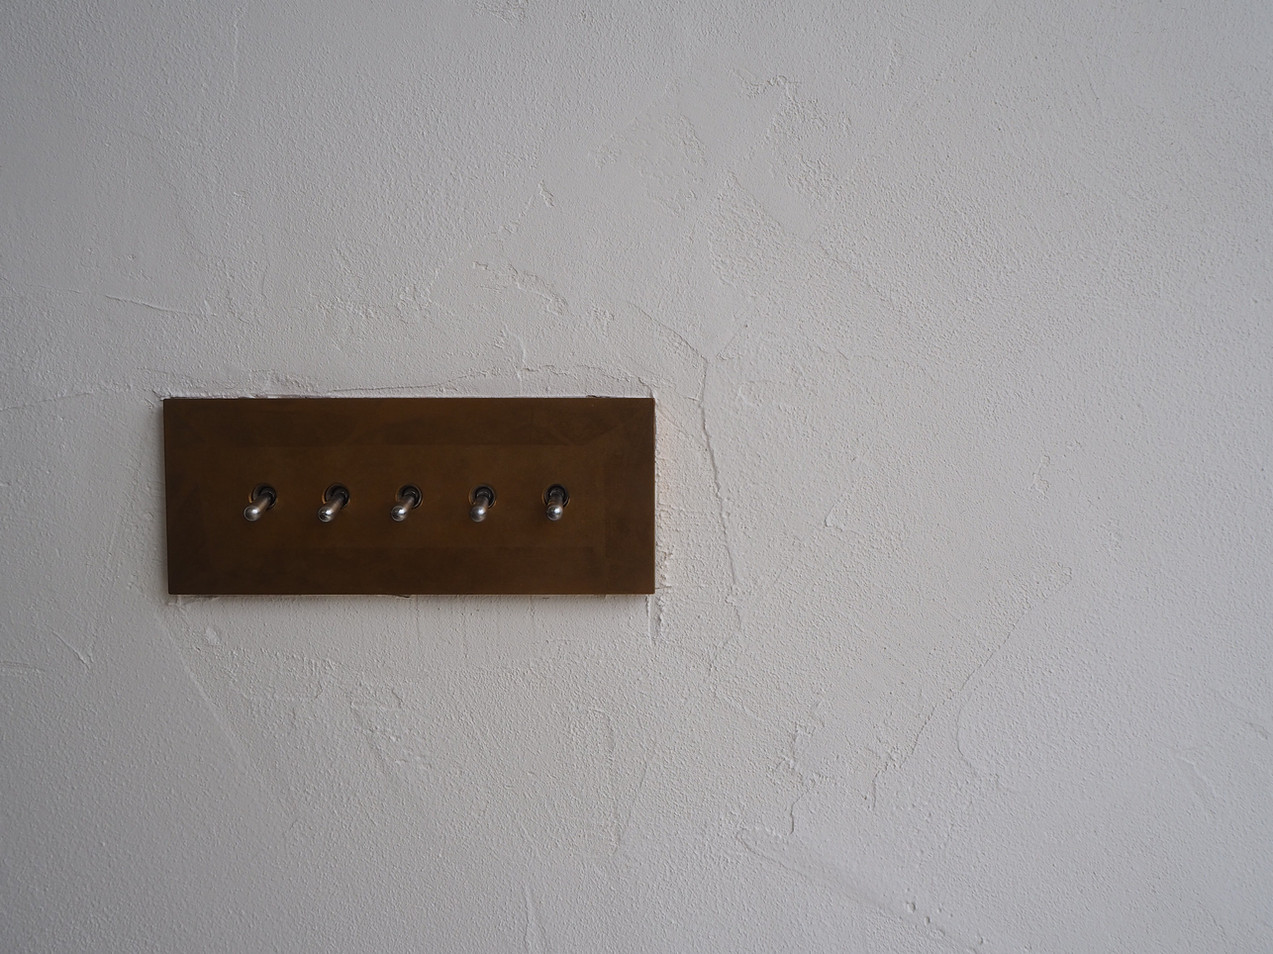 seino takashi design office & house 01_9